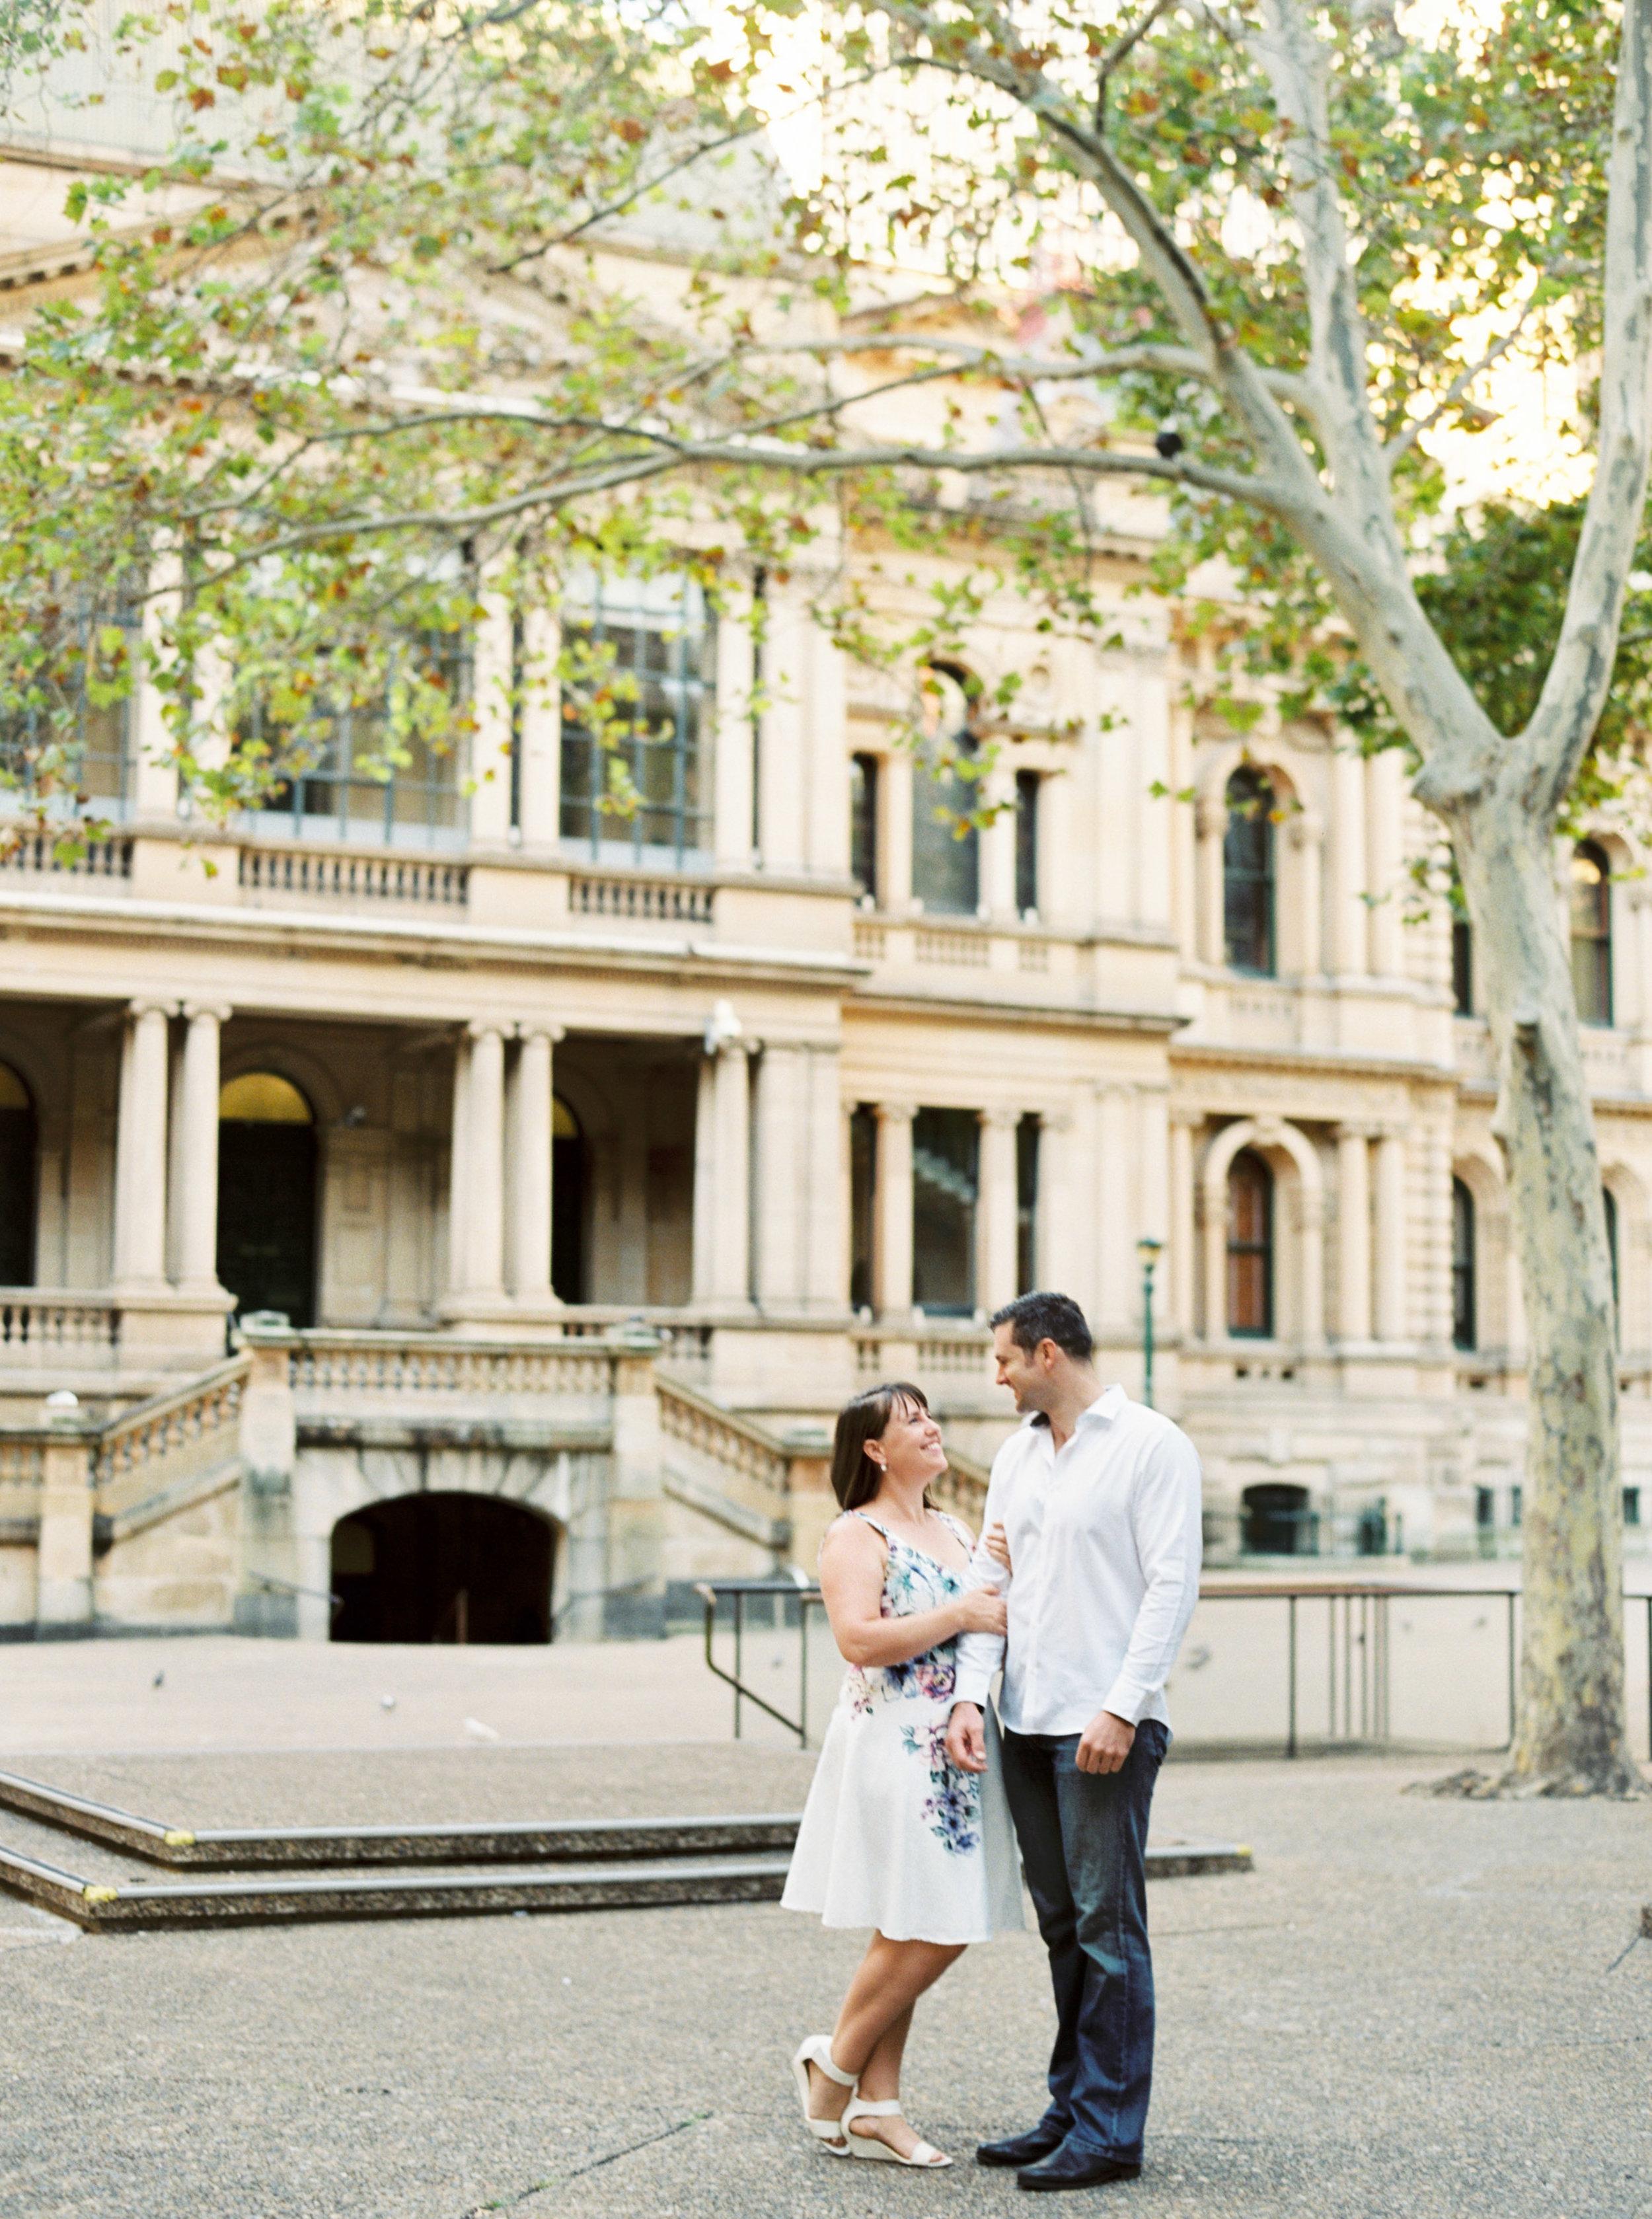 00001- Fine Art Film Newcastle Sydney NSW Wedding Photographer Sheri McMahon.jpg